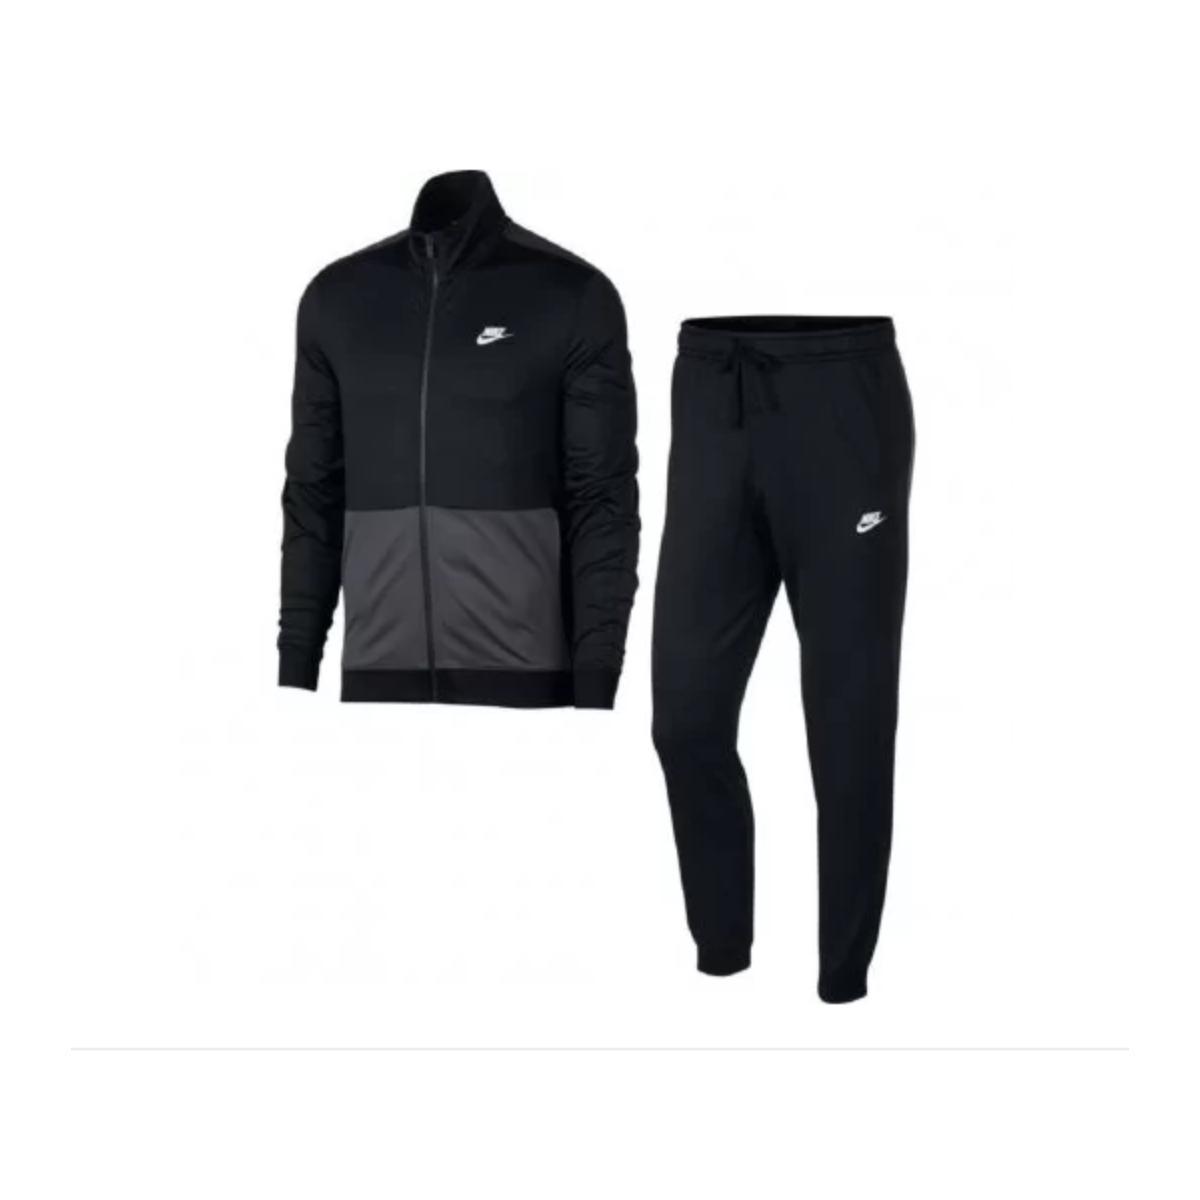 Abrigo Masculino 928109-011 Nike Sportswear Preto/chumbo